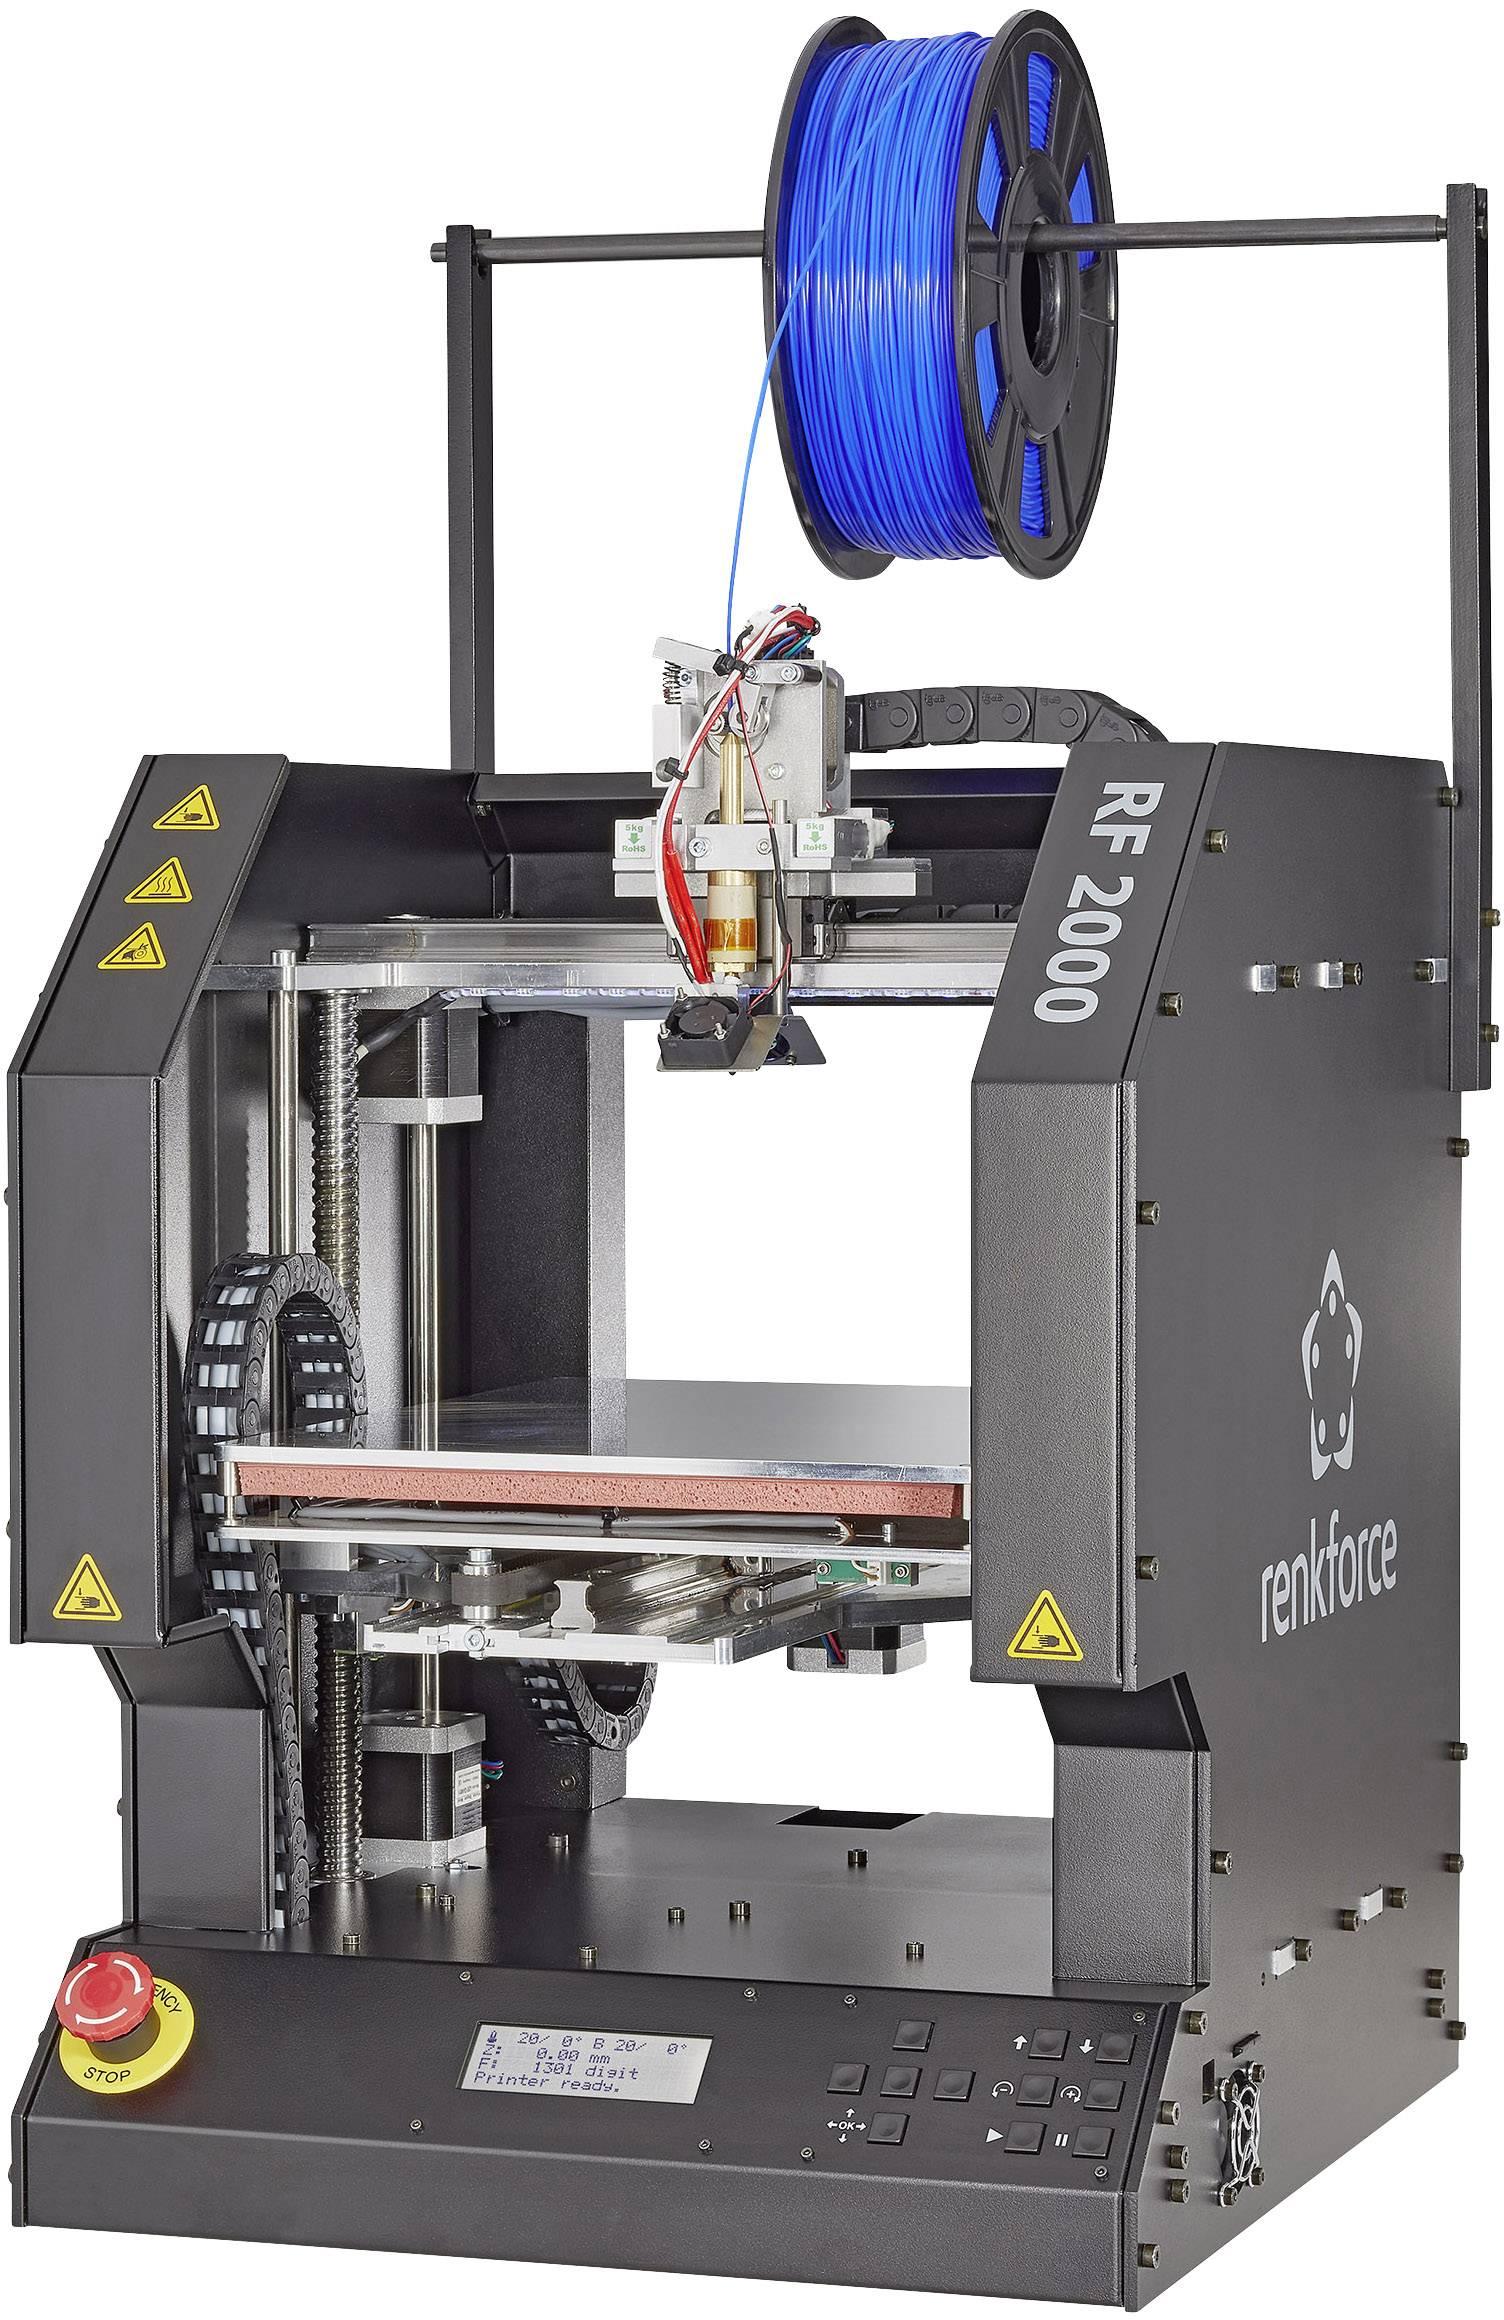 3D tiskárna Renkforce RF2000v2 FGS, zdokonalená verze, 1 extrudér